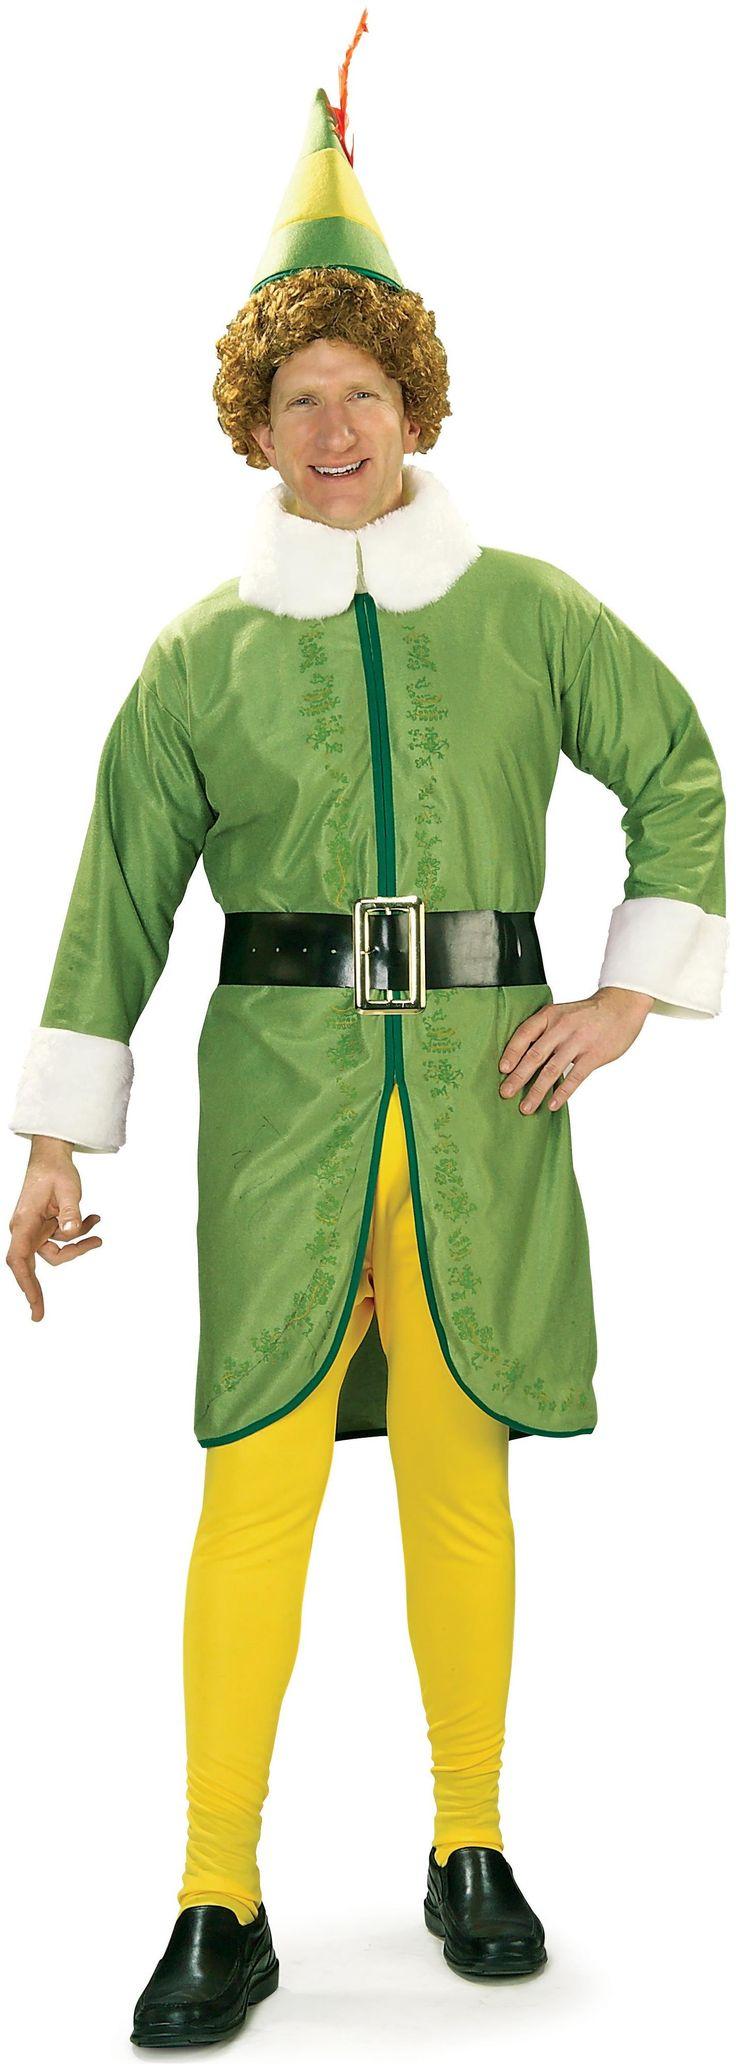 Buddy Elf Adult Costume Buddy the elf costume, Buddy the